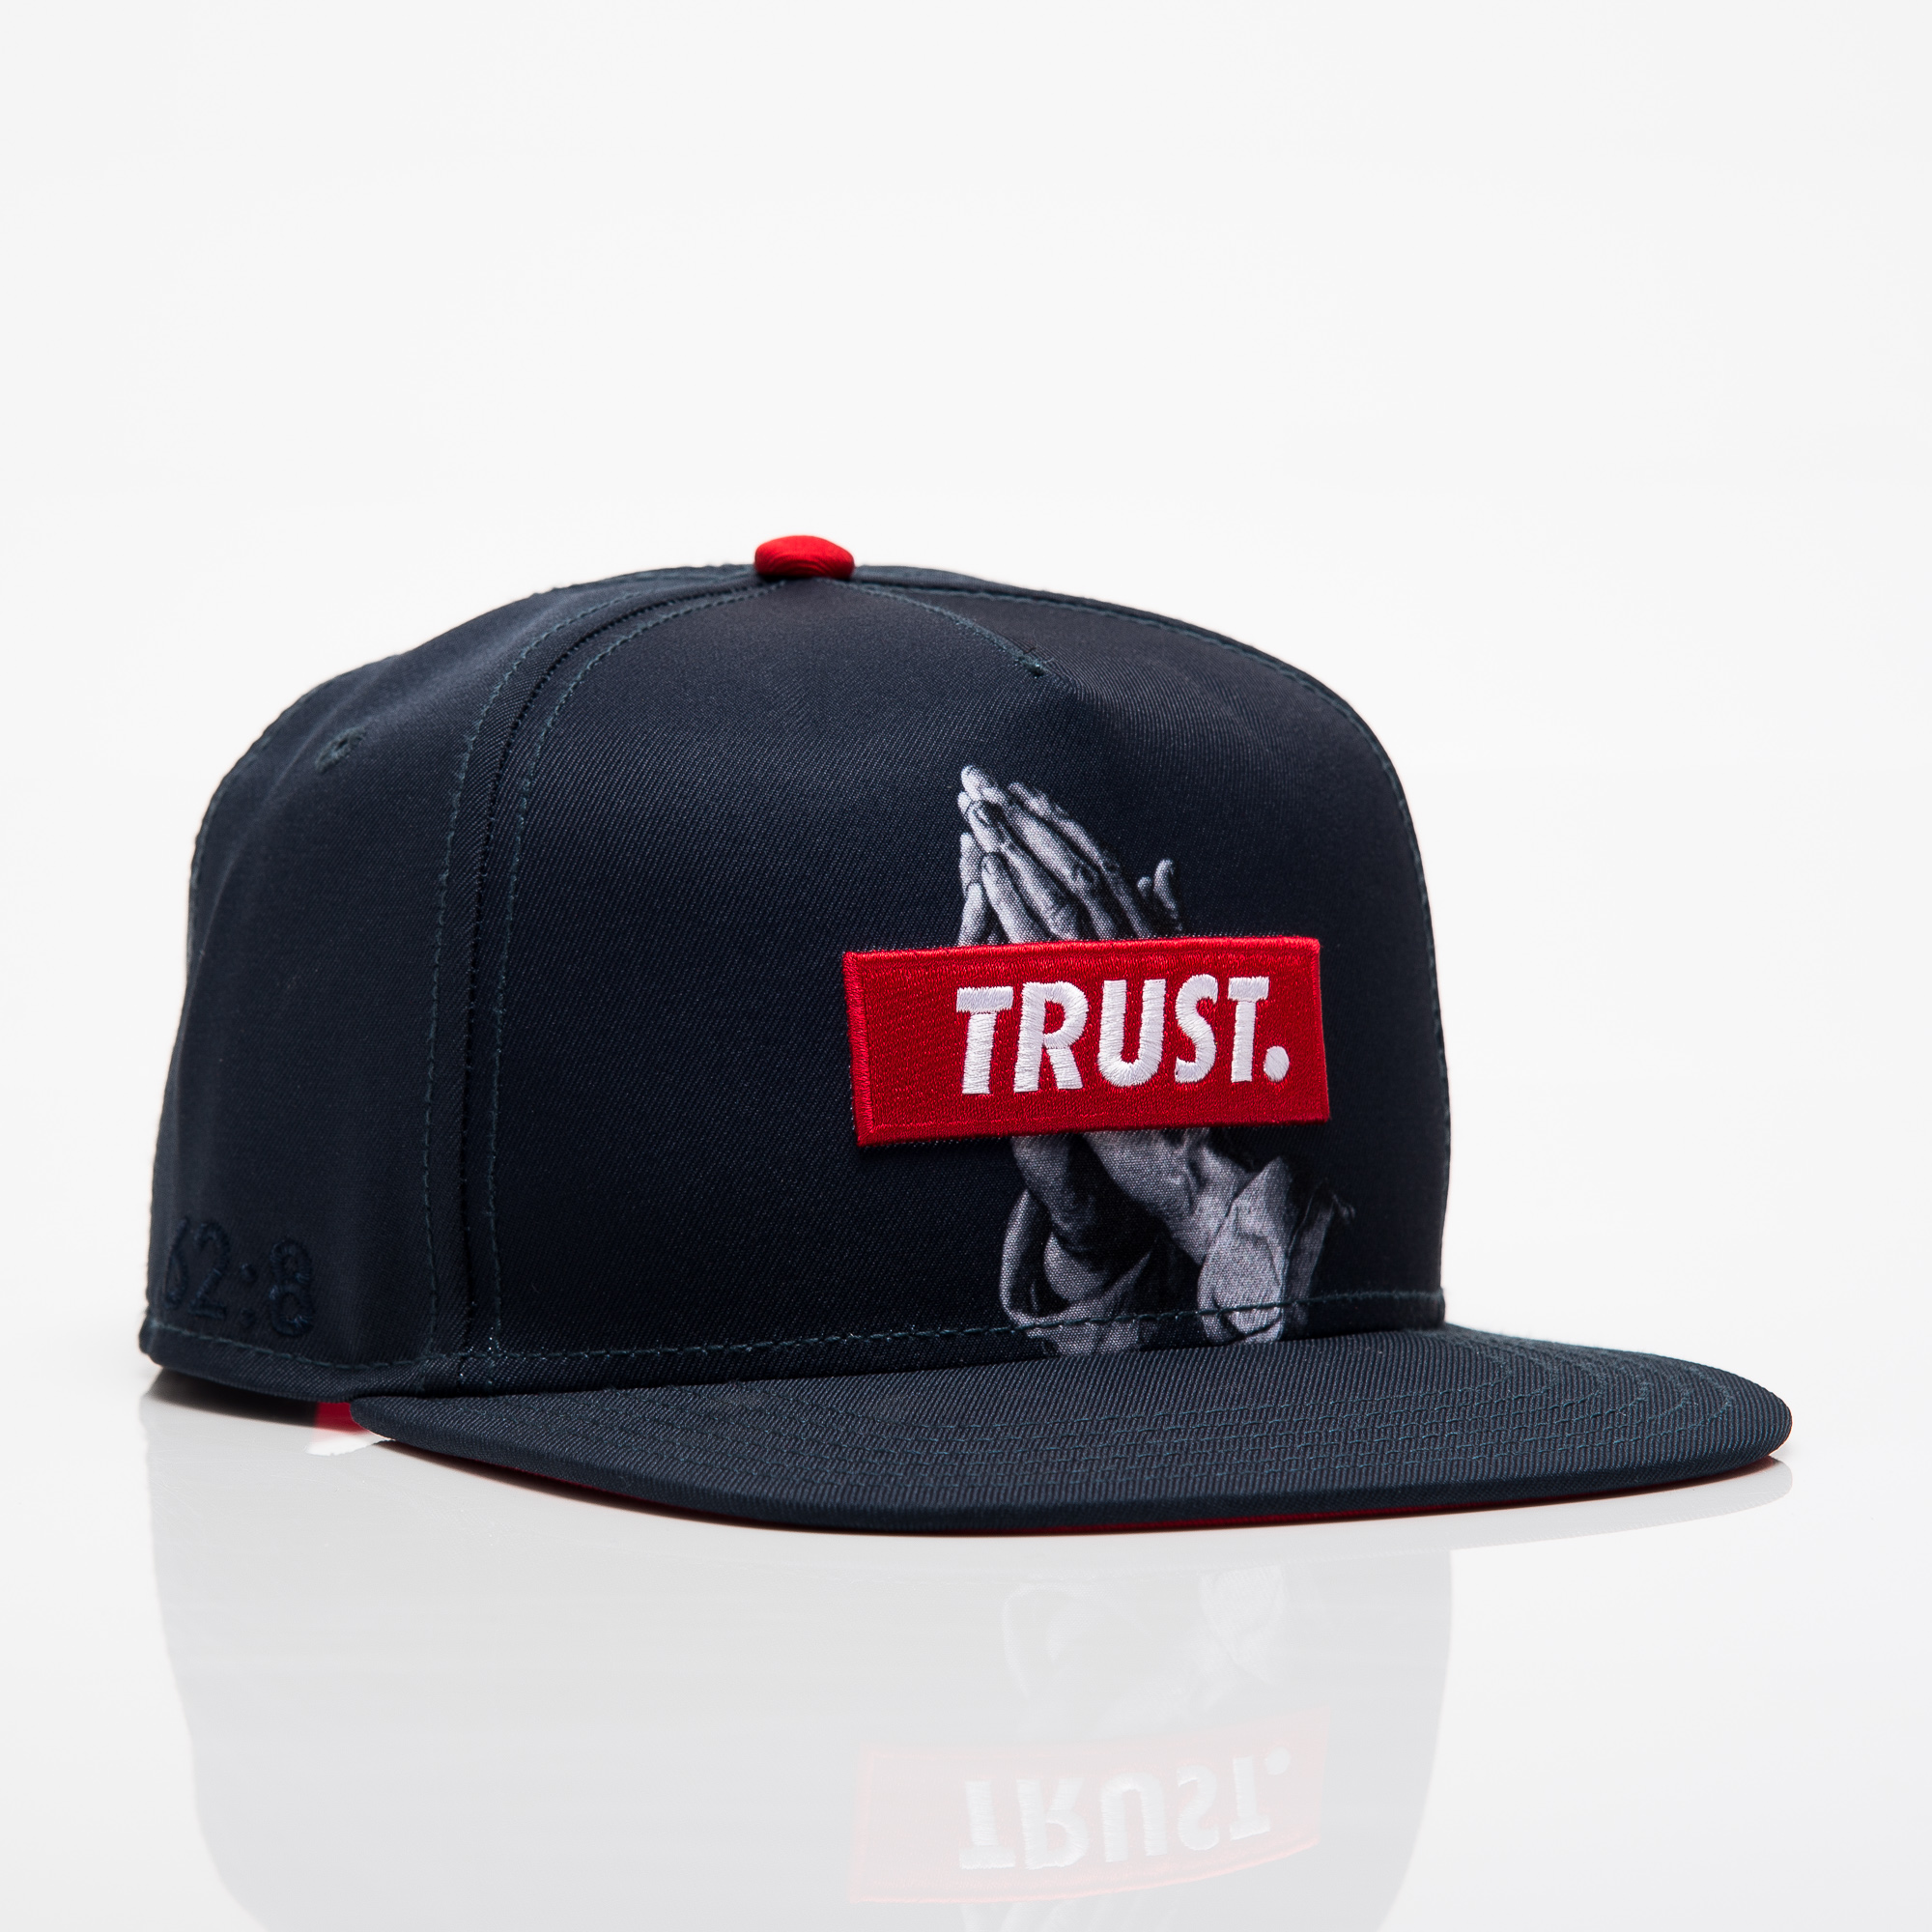 5f0262c7bd048 Cayler   Sons Trust Snapback - Caps Snapbacks - Sporting goods